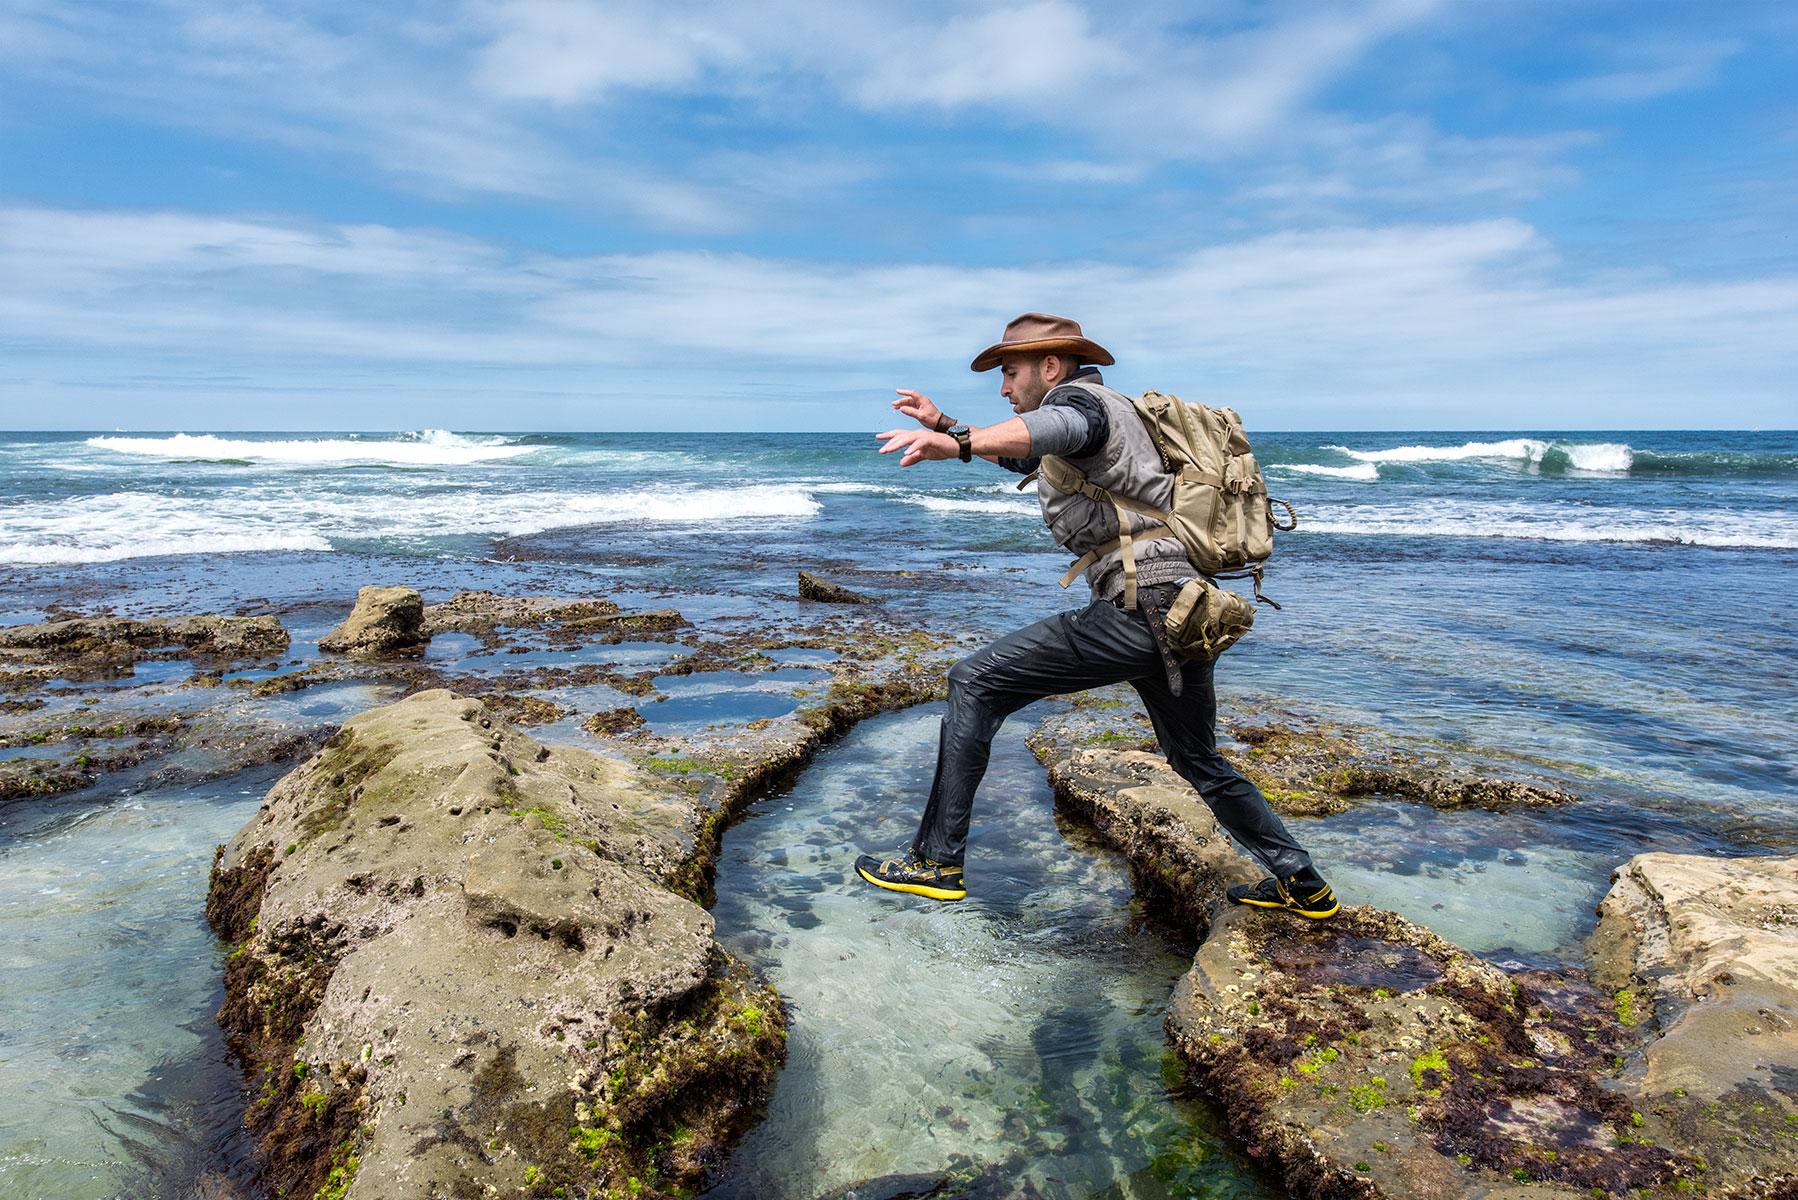 austin-trigg-brave-wilderness-la-jolla-california-jump-reef.jpg